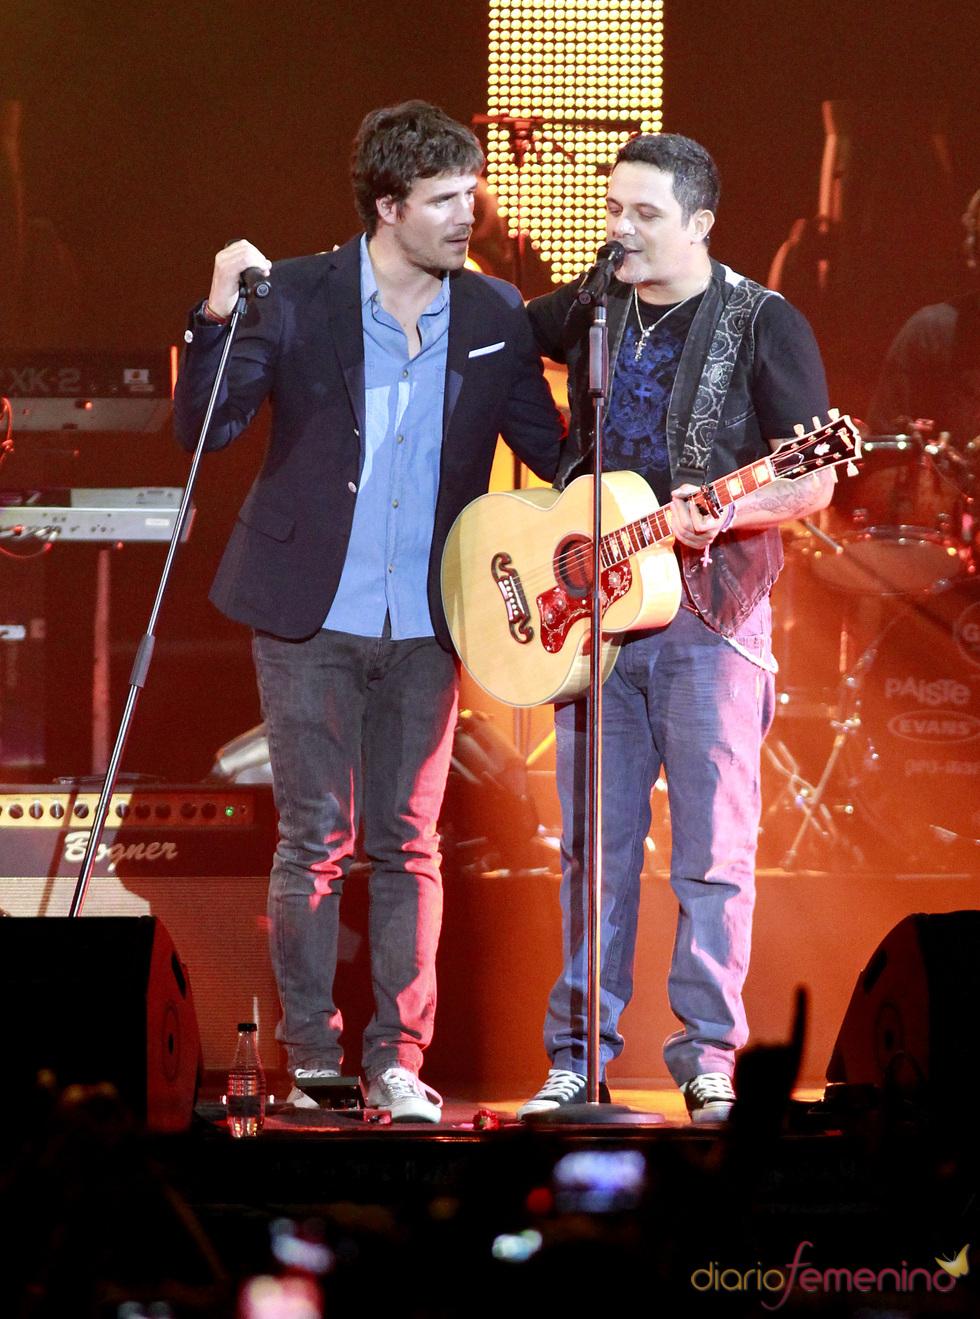 ¿Cuánto mide Alejandro Sanz? - Estatura real: 1,70 - Real height 6769_dani-martin-a-duo-con-alejandro-sanz